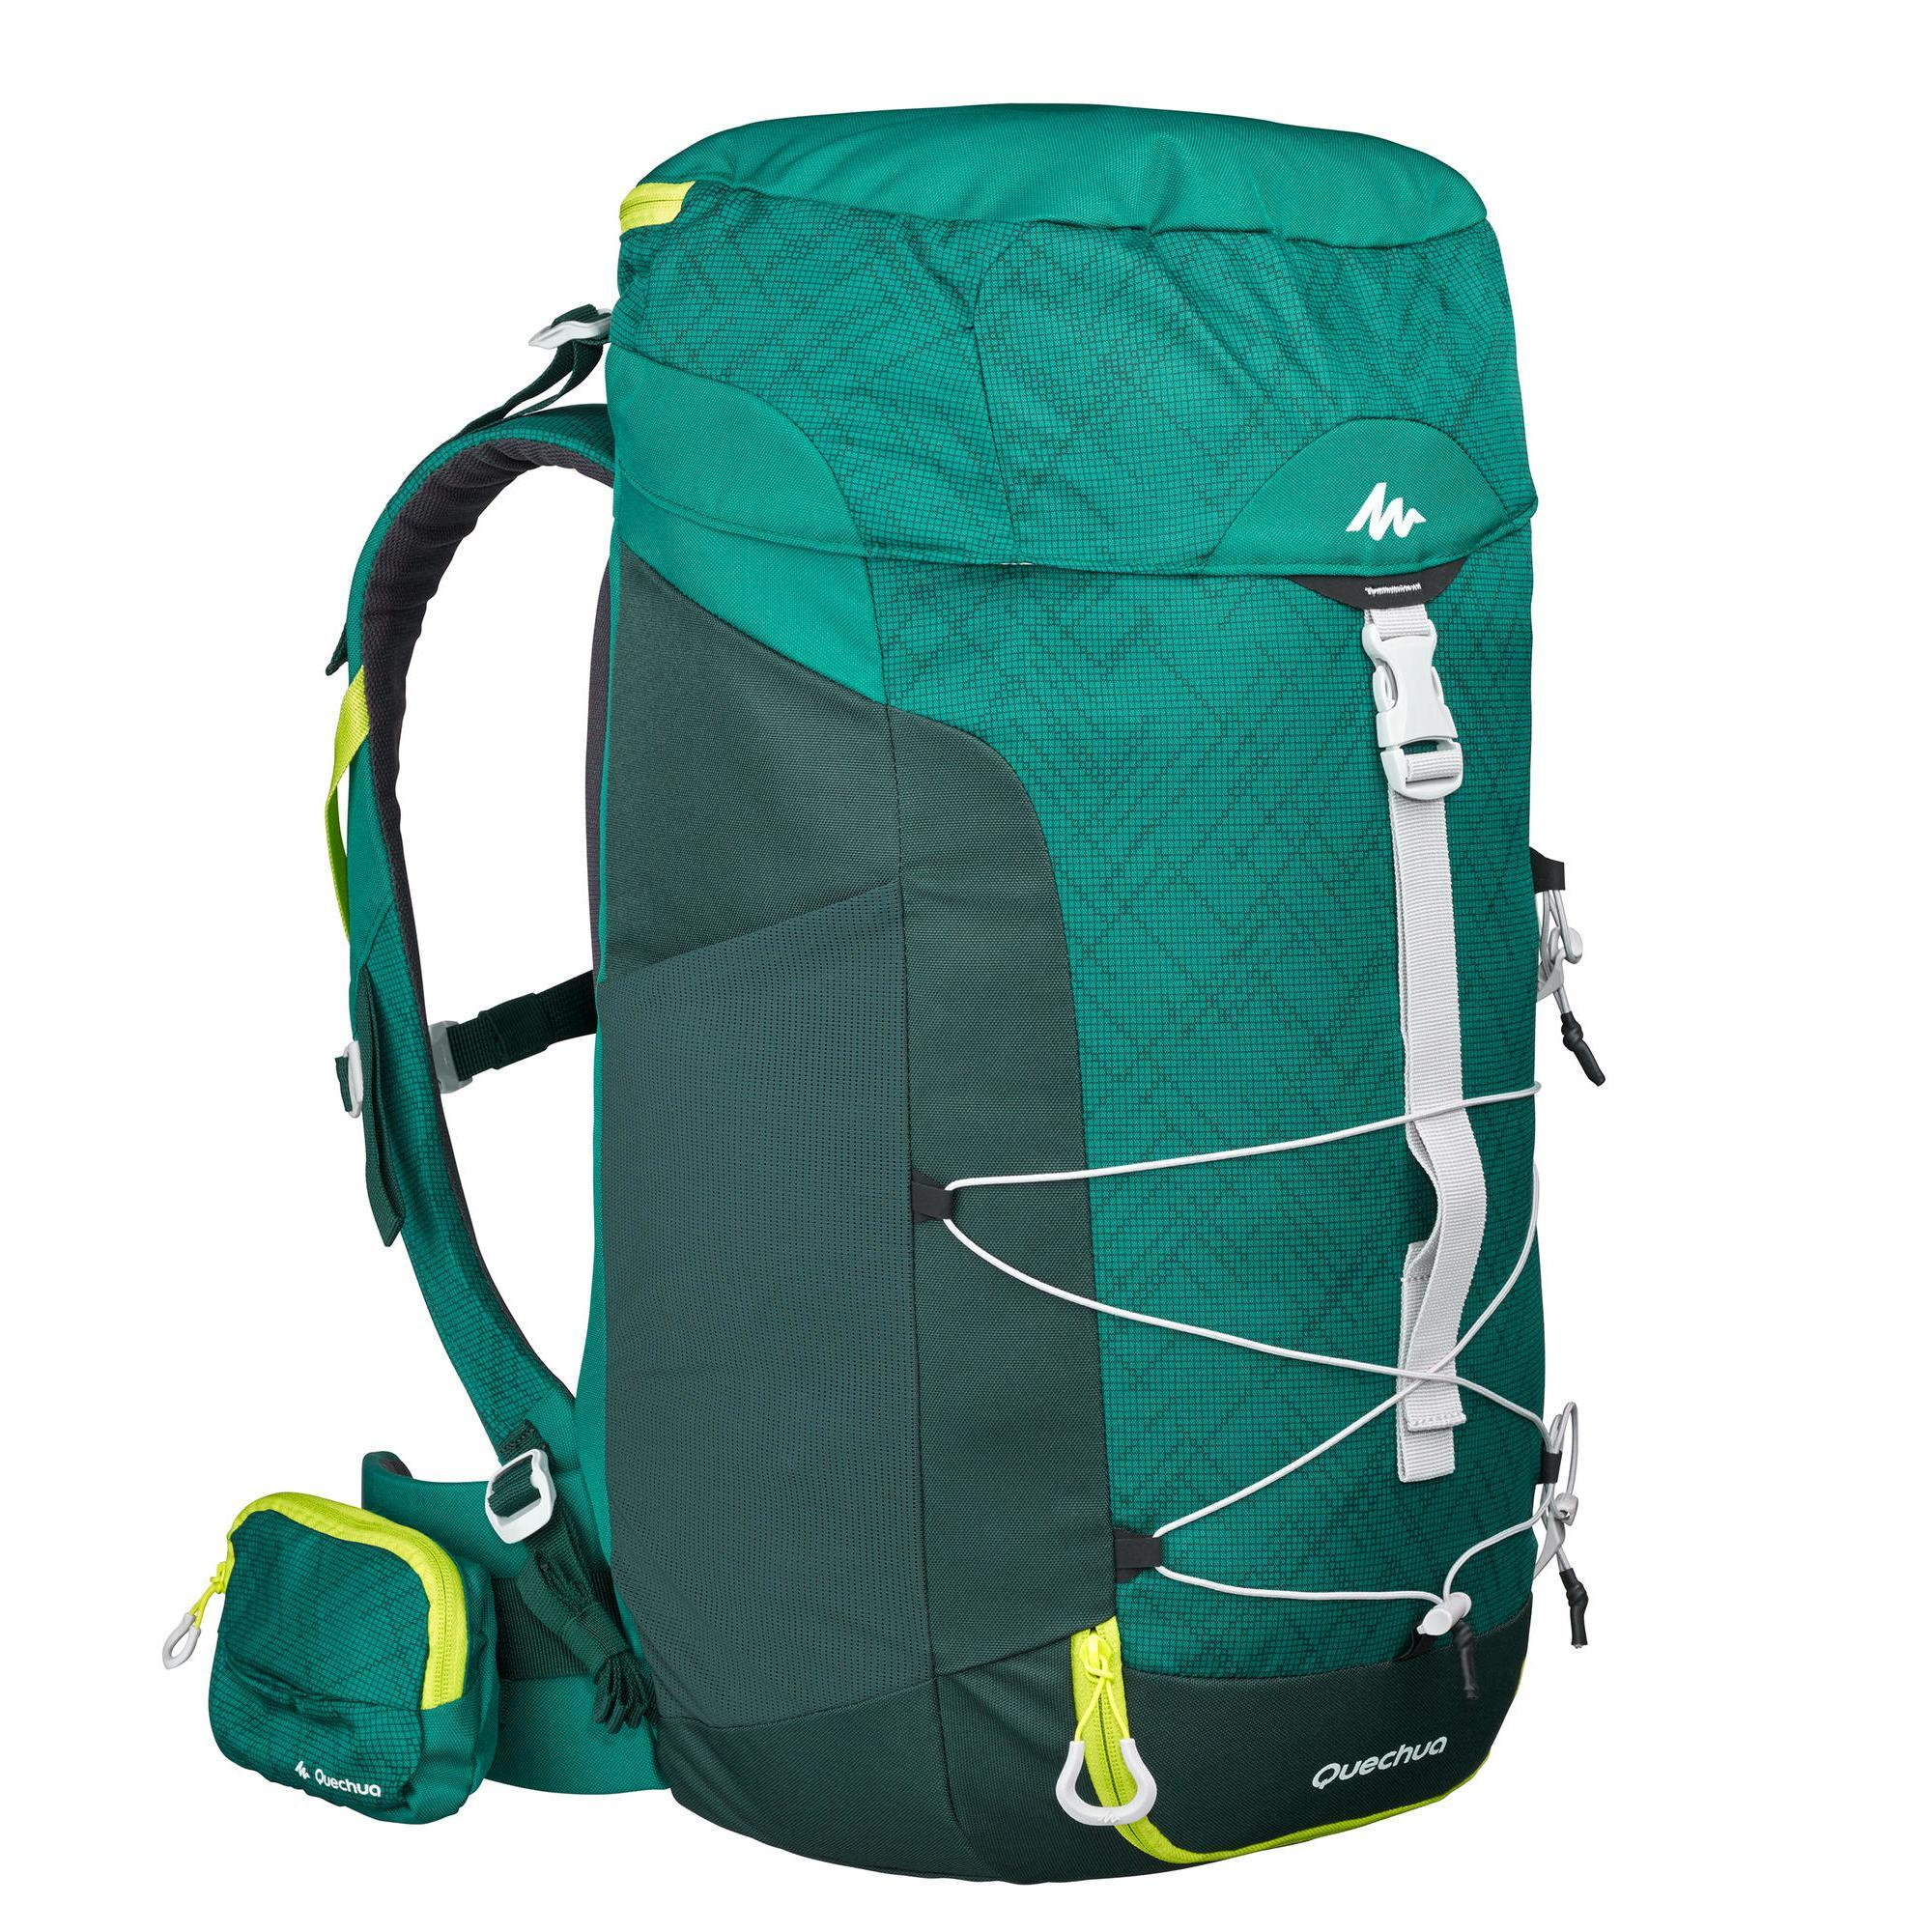 mochila de viaje de decathlon 40 l